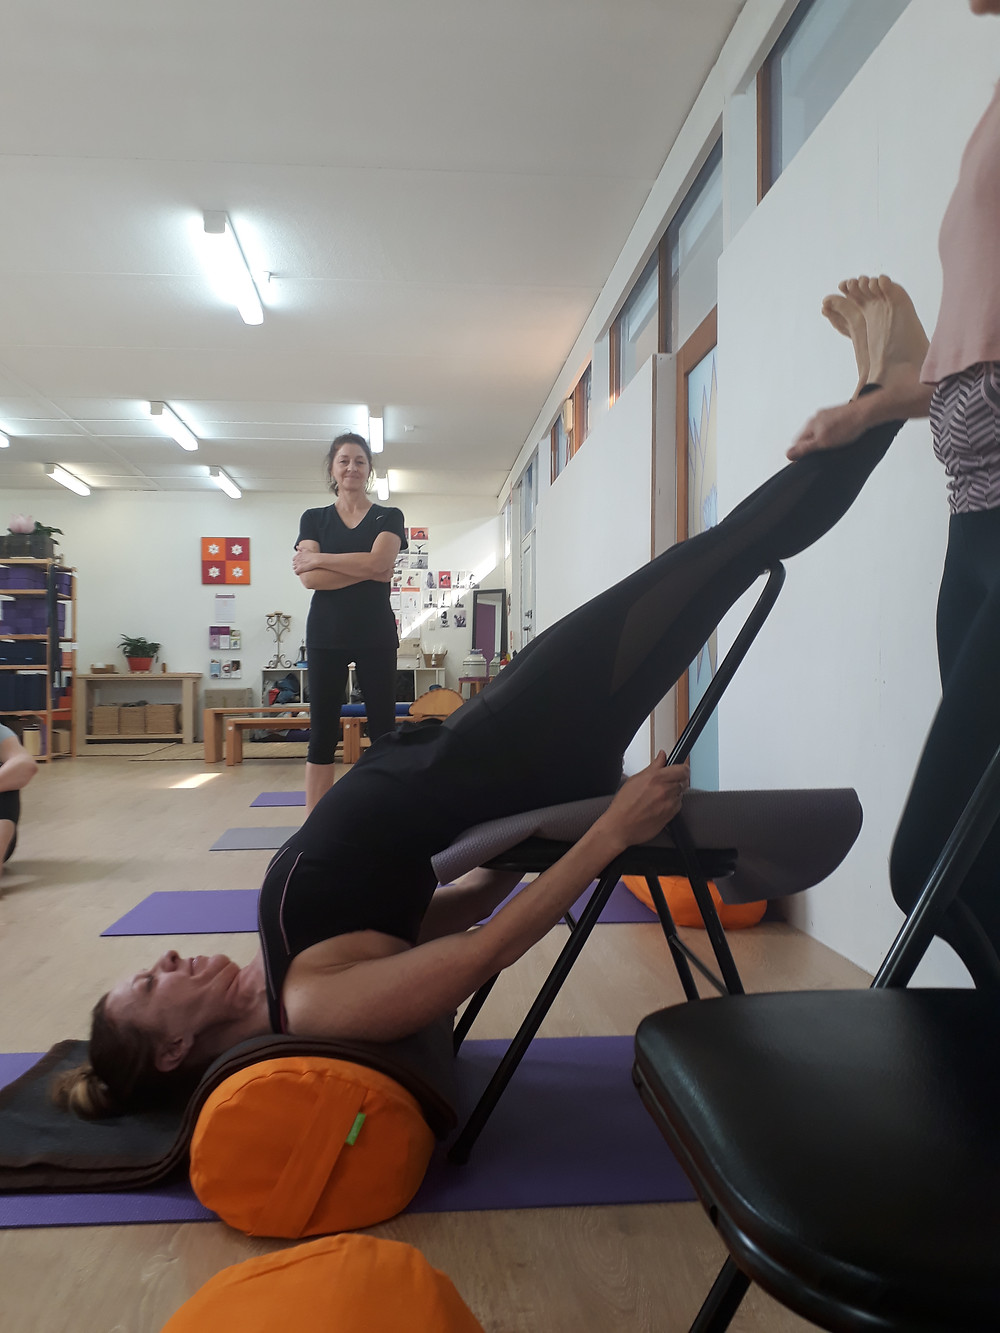 Restorative Shoulderstand - Hills Yoga